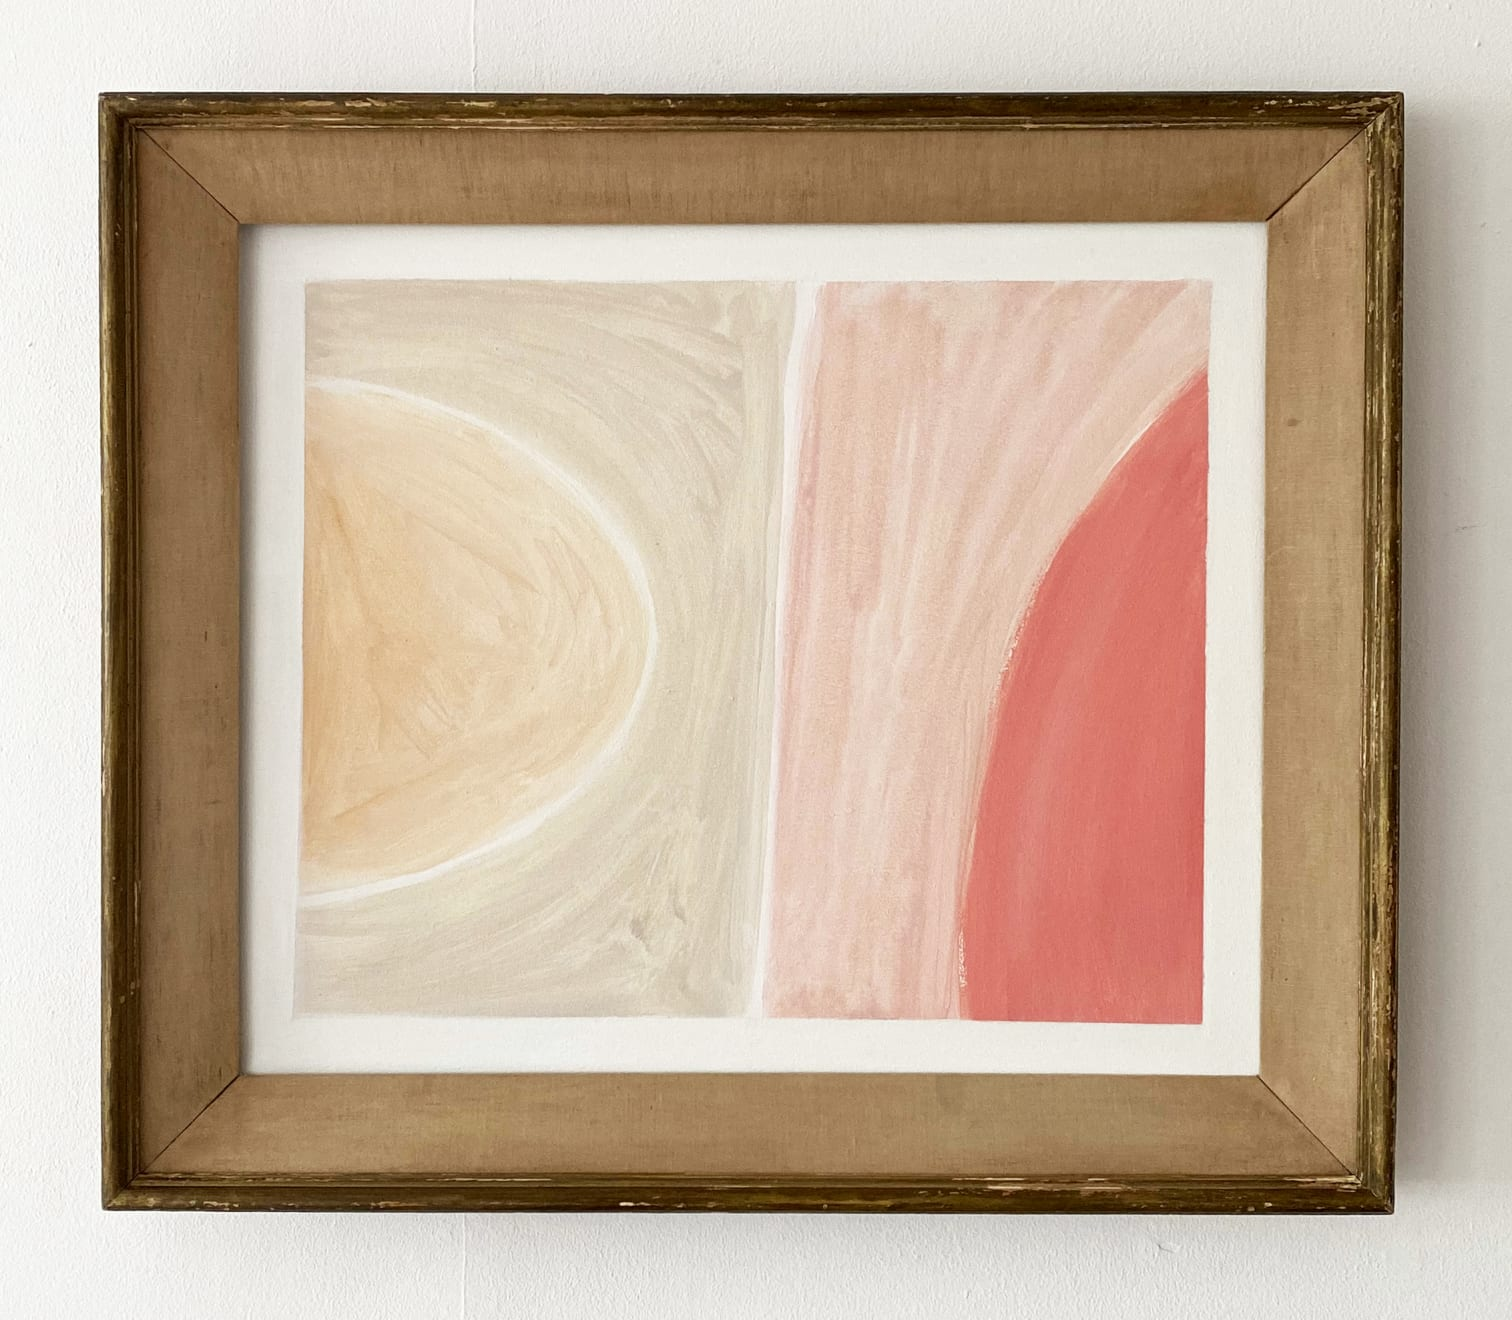 Caroline Popham, Pink Moon, 2020